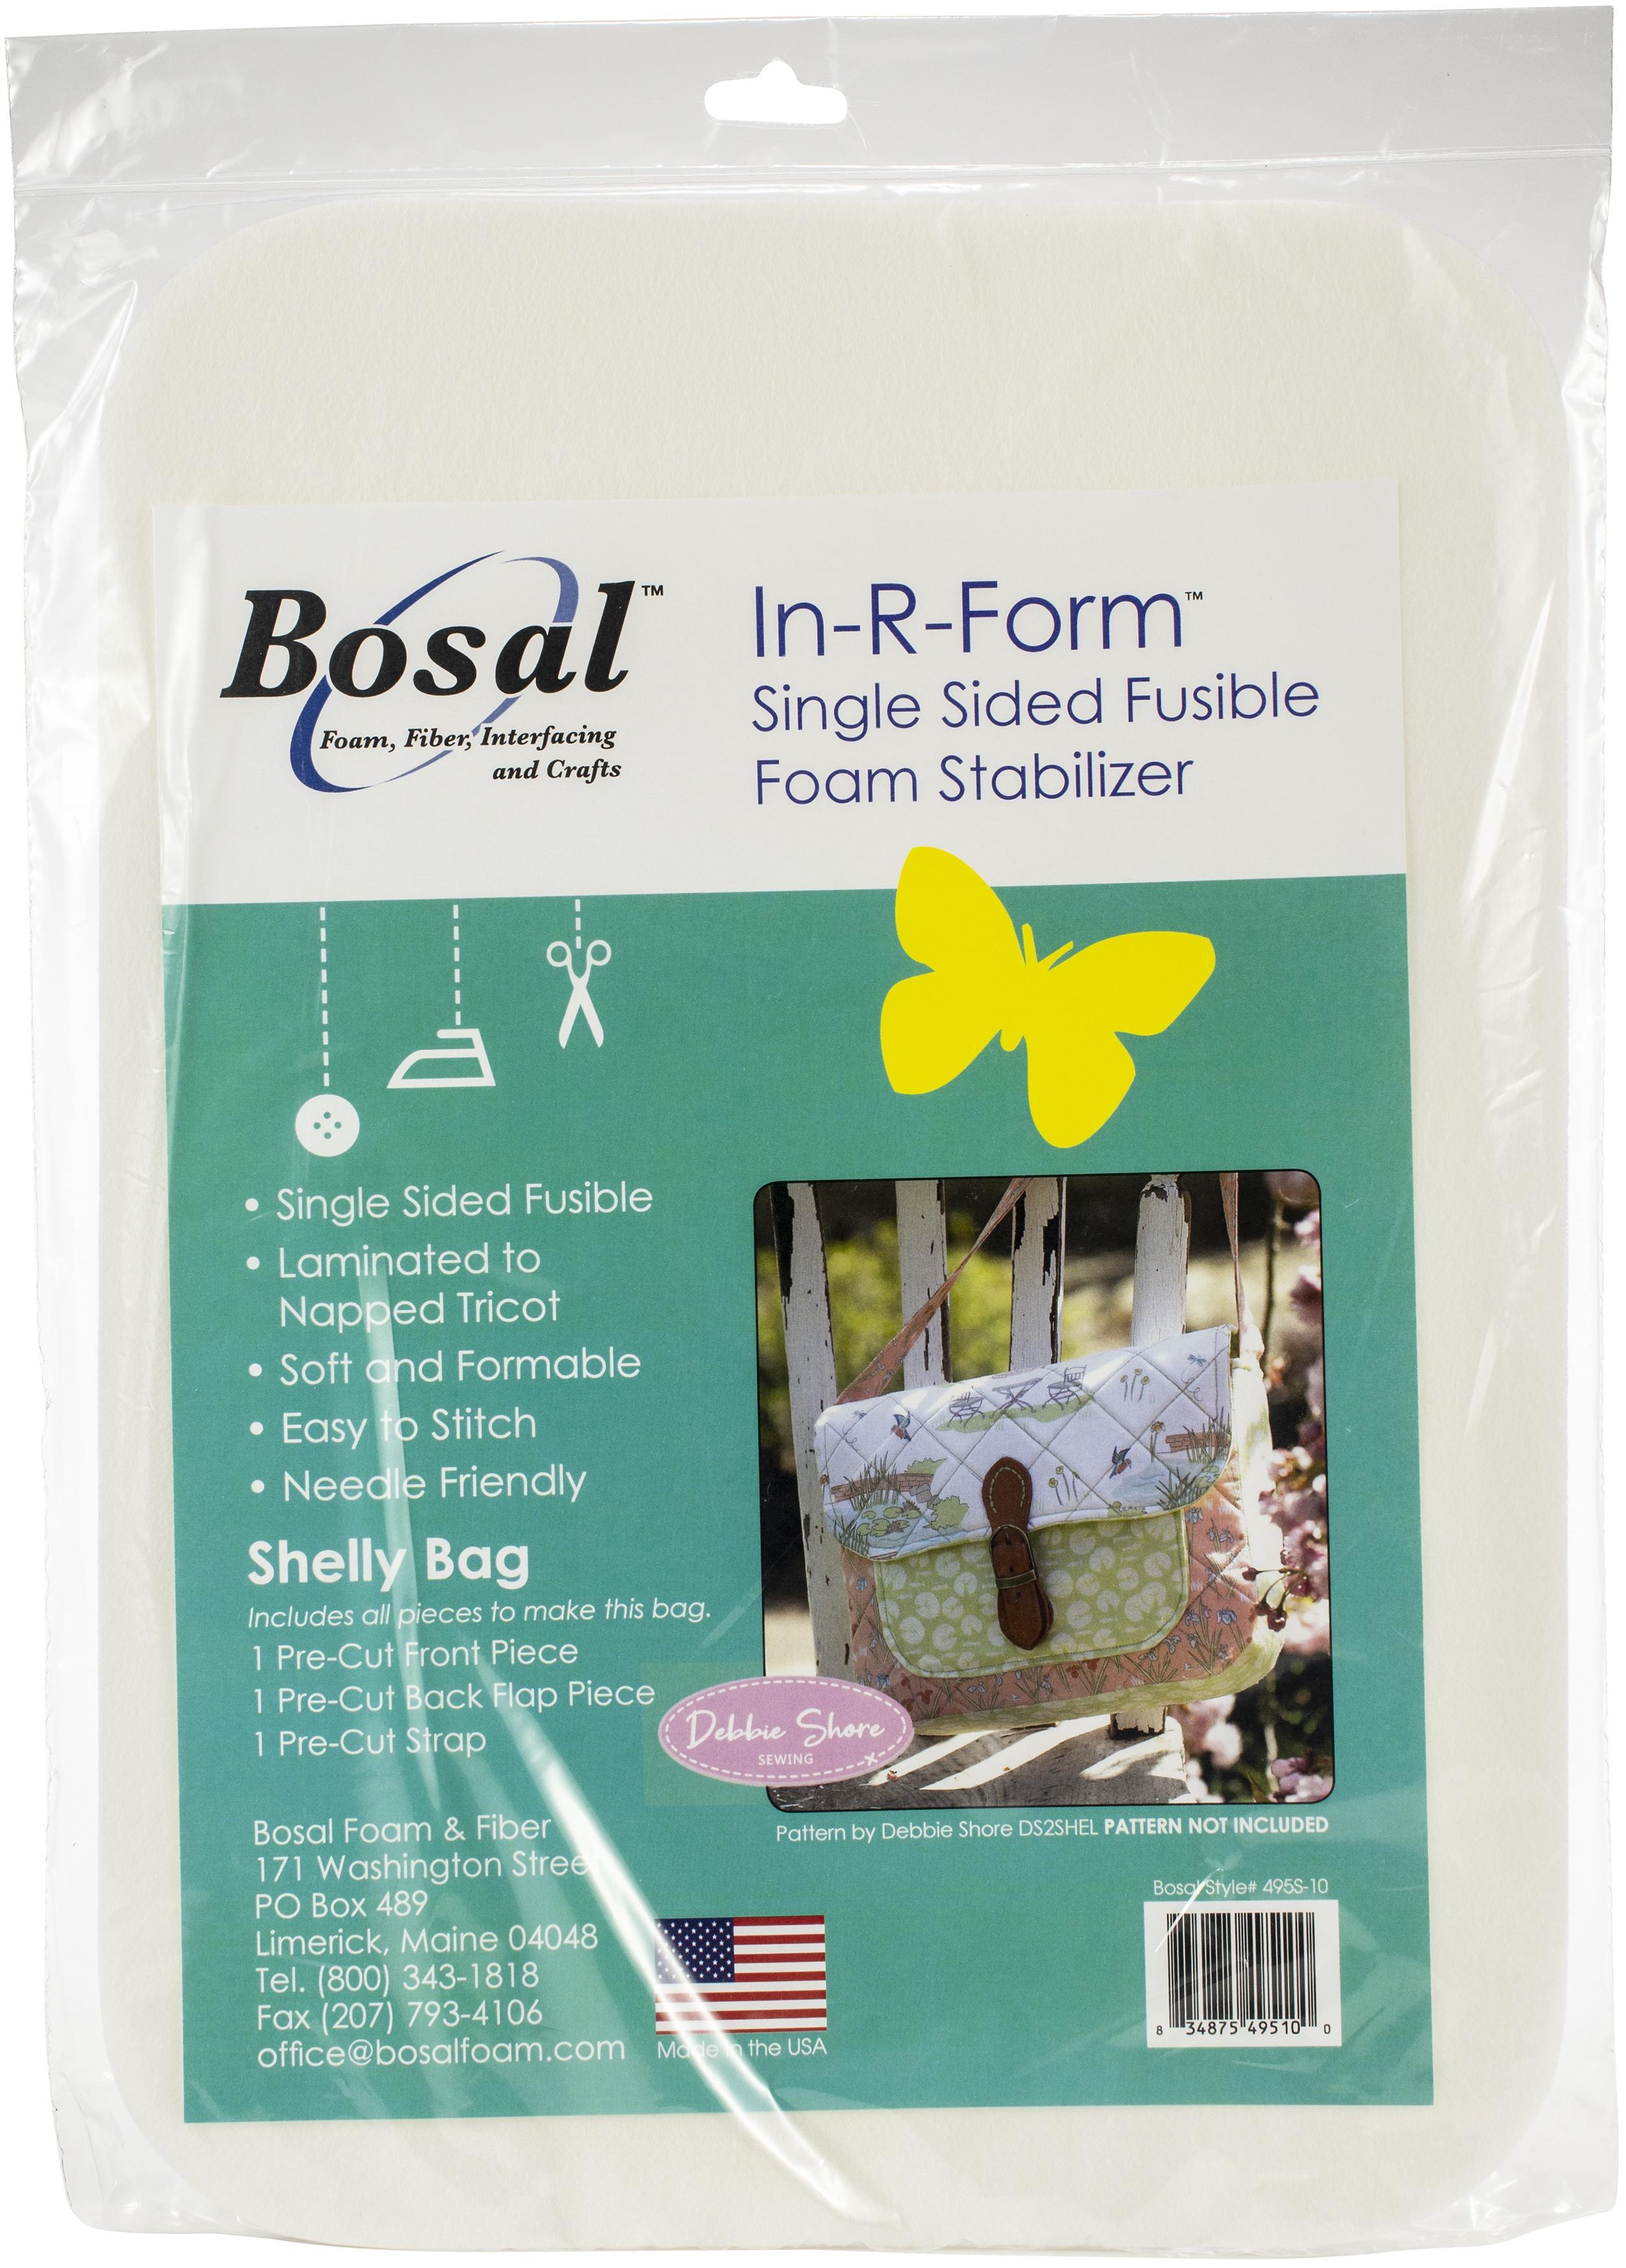 Bosal In-R-Form Unique Fusible Foam Stabilizer-Shelly Bag